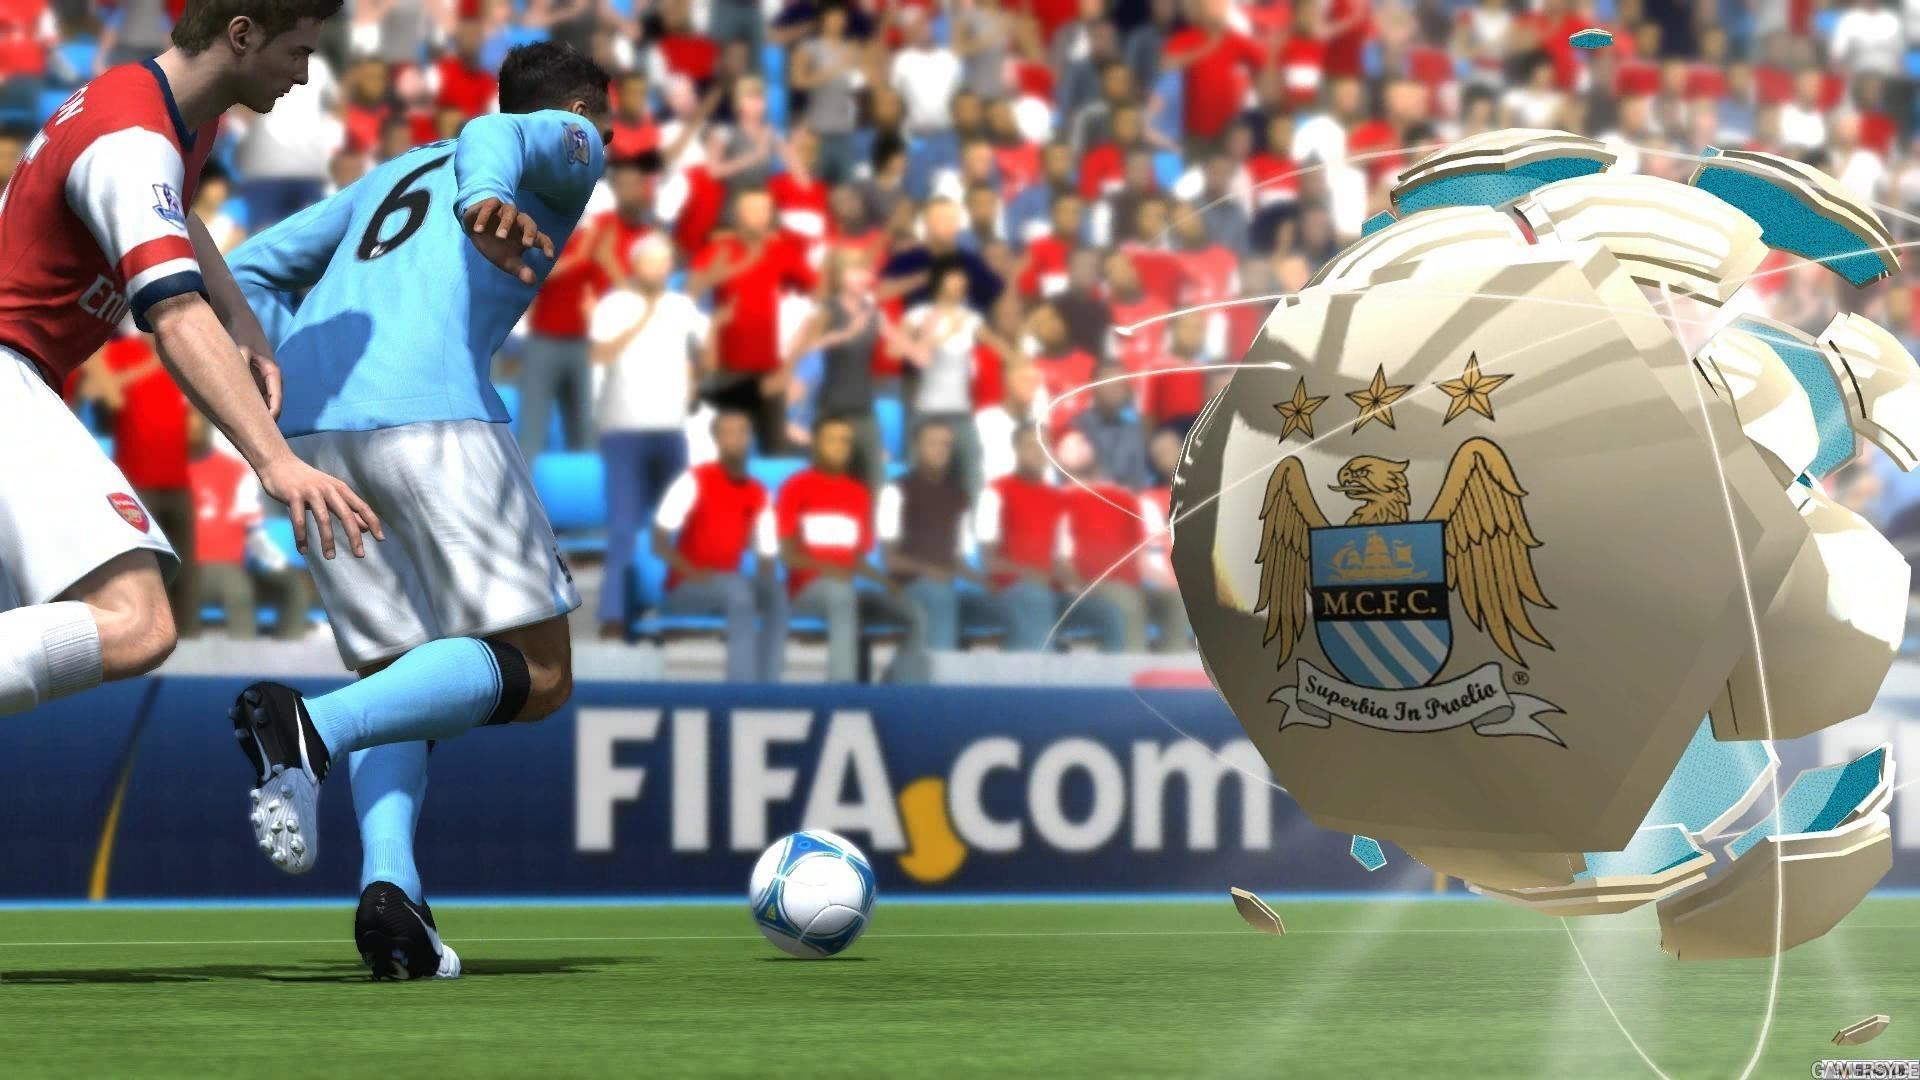 image fifa 13 20261 2509 0002 تصاویر جدید از بازی FIFA 13